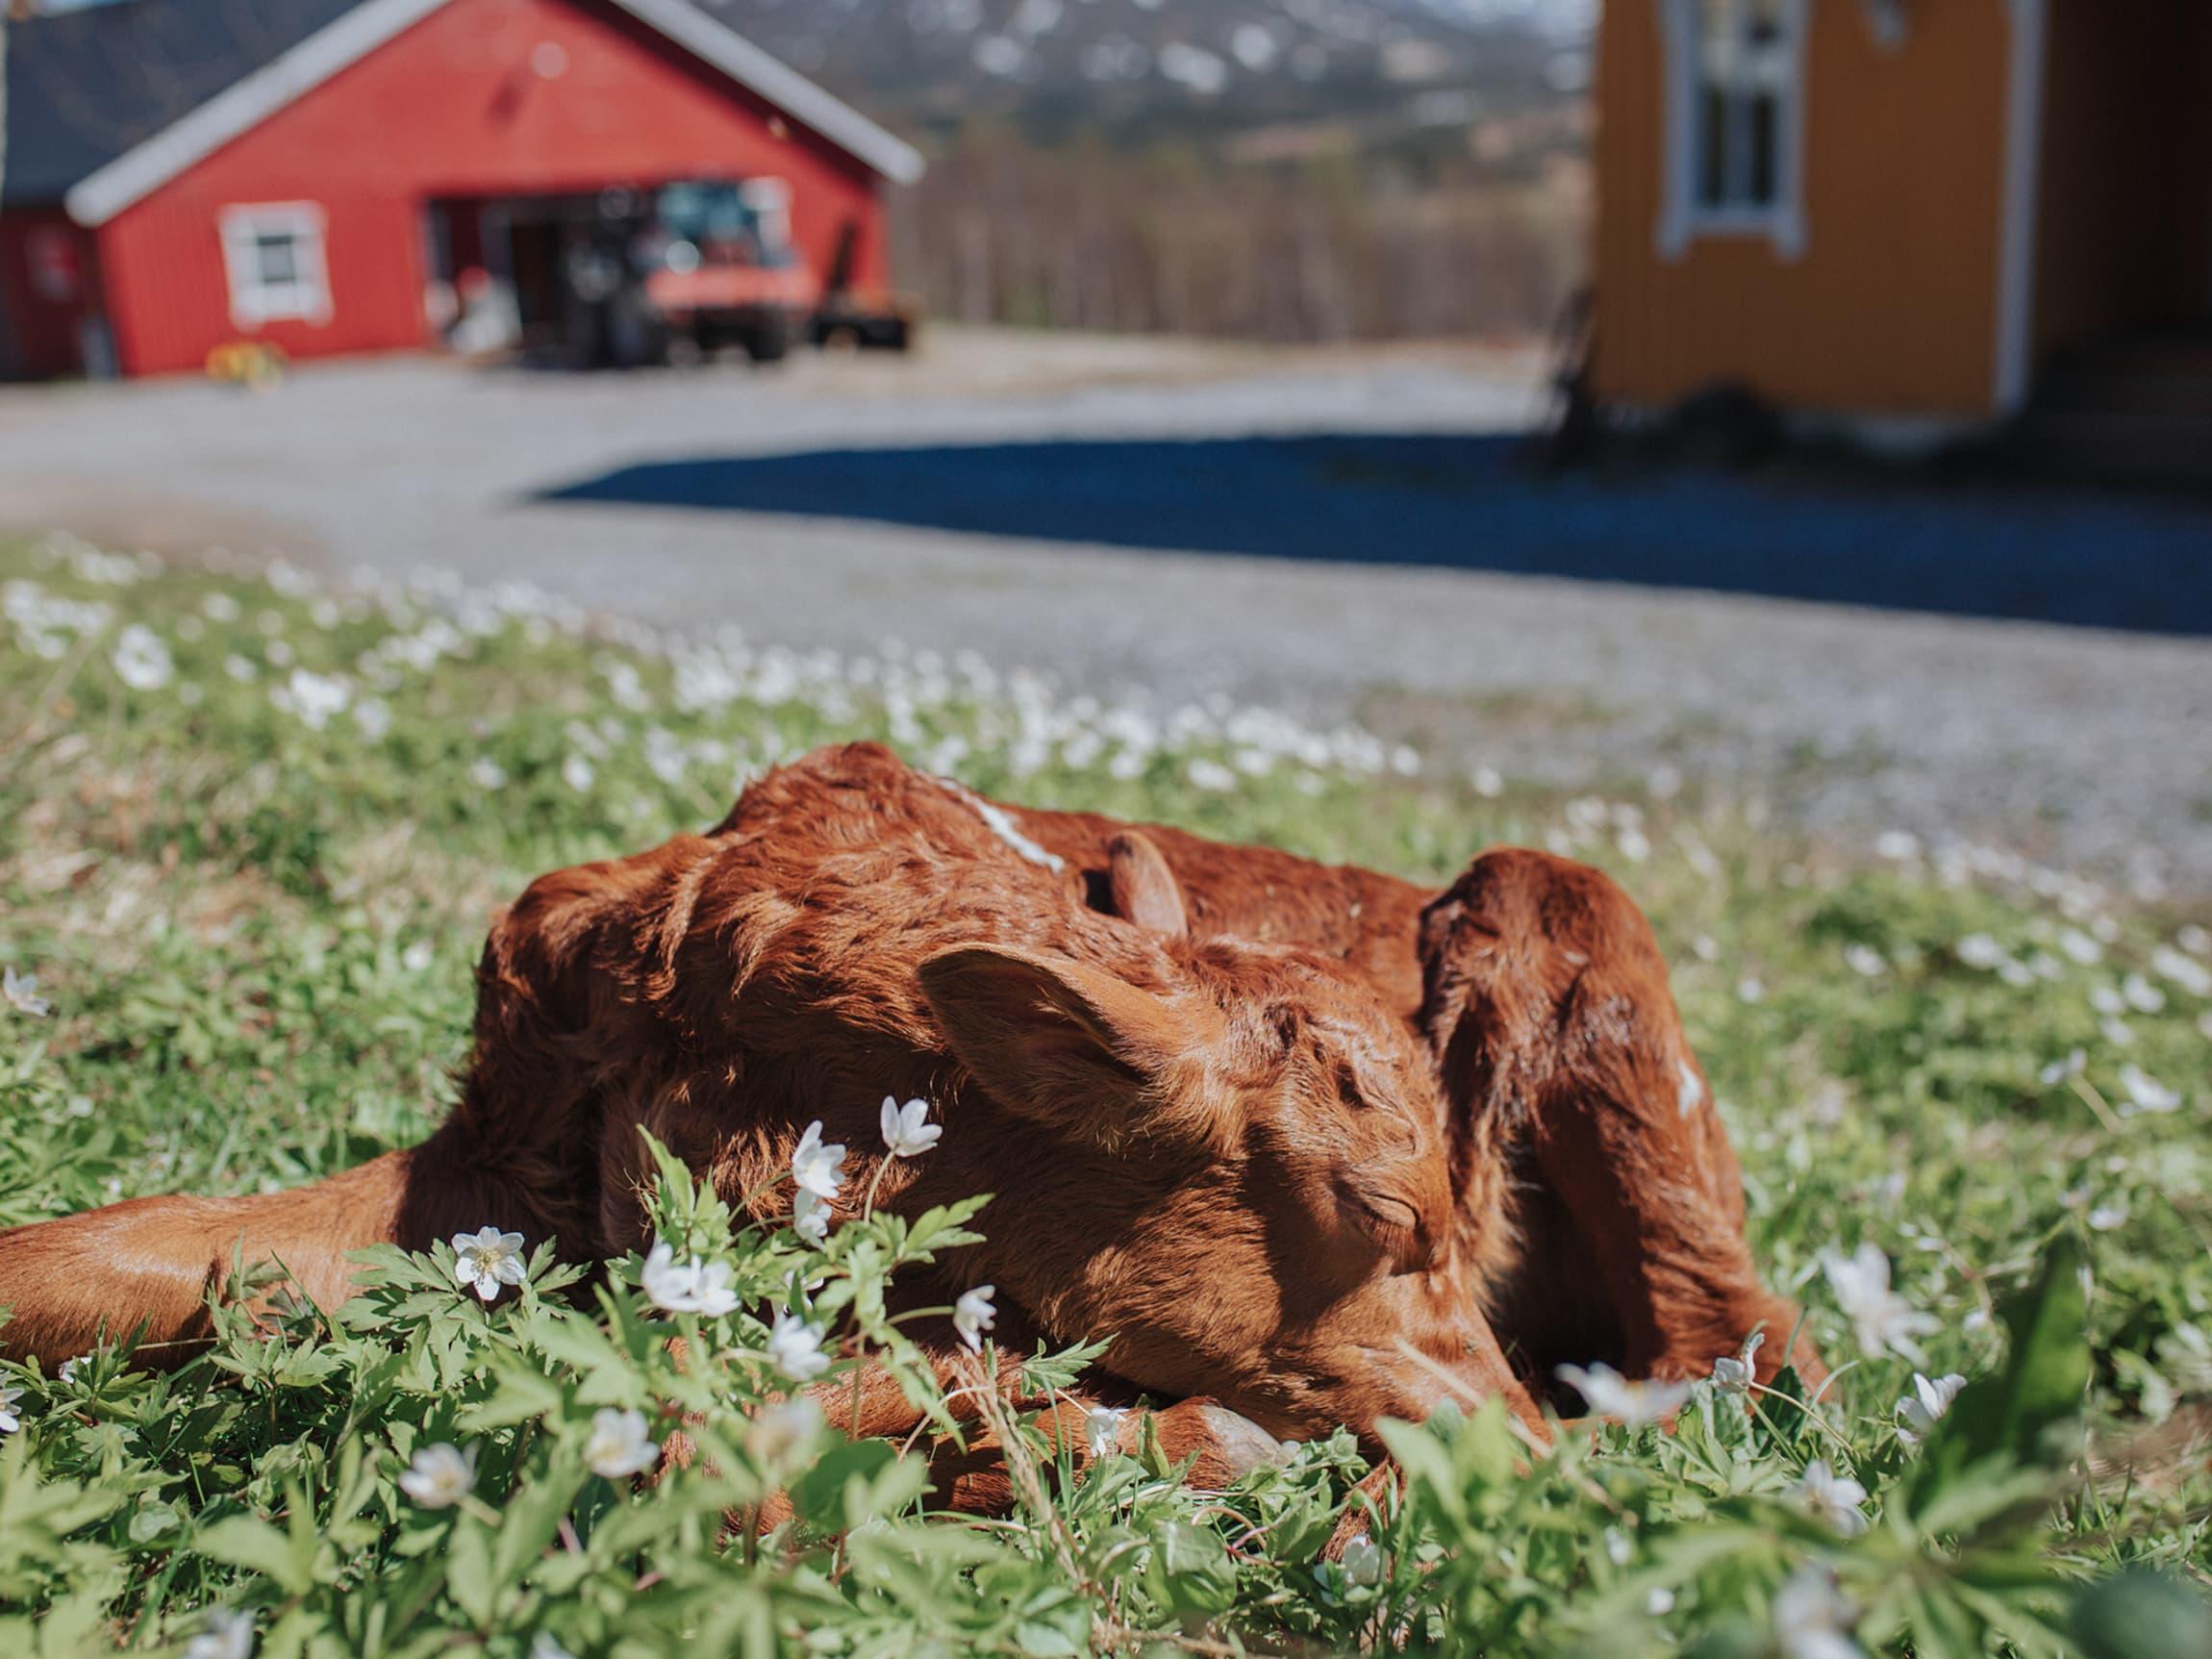 Når osten ystes på gårdsysteriet på familiegården, er melka fremdeles varm – rett fra kyrne på gården.